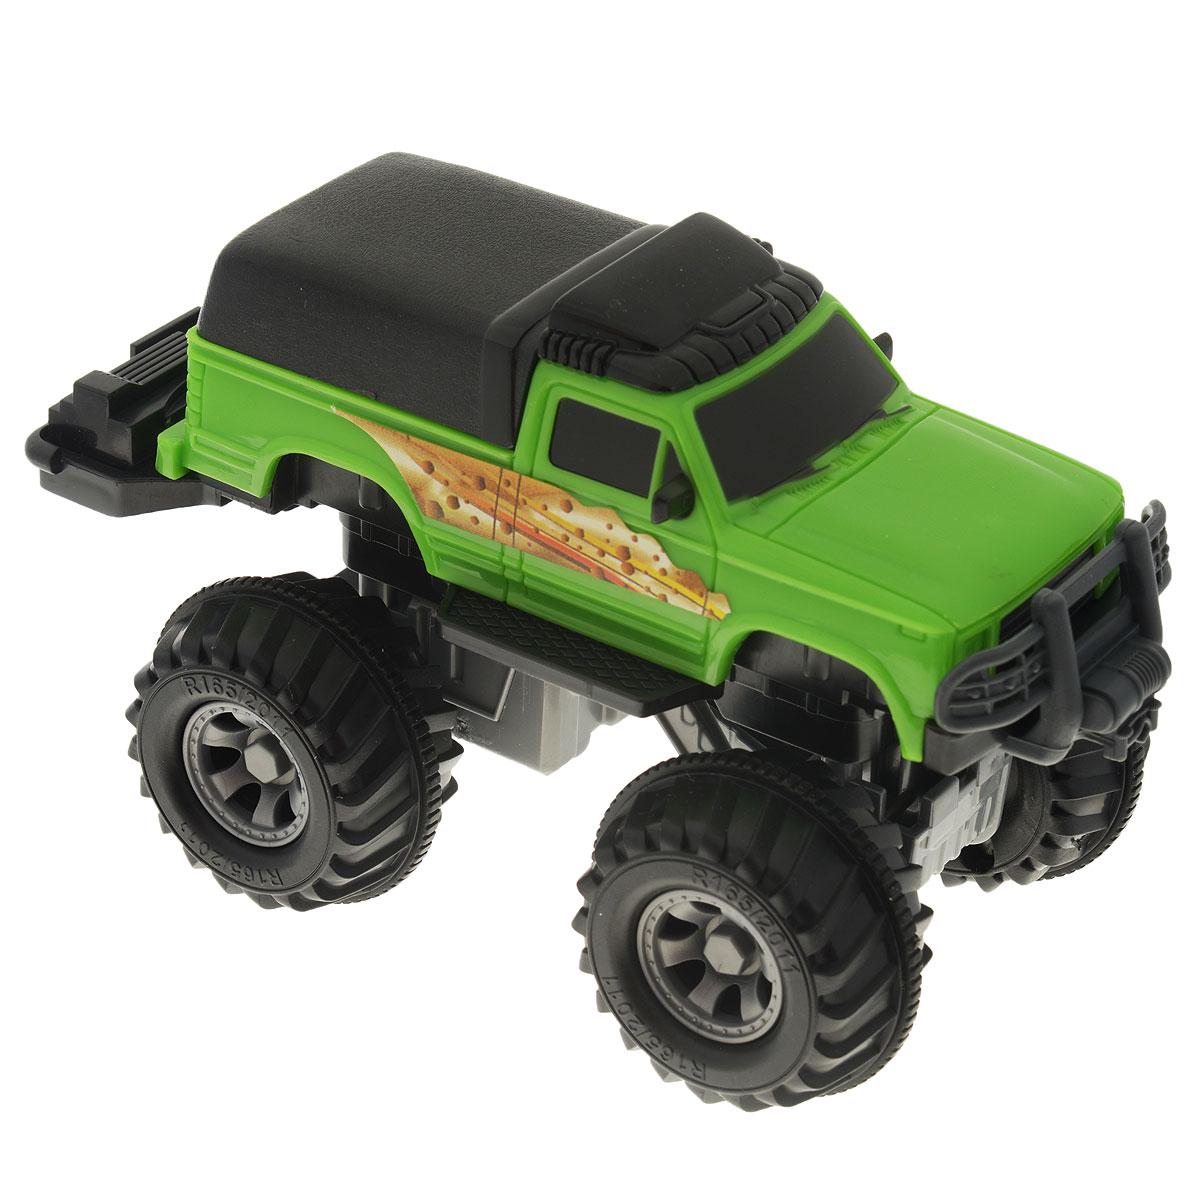 Autotime Машинка Monster Truck, цвет: зеленый. Масштаб 1/32. 10242-00-RUS машинки autotime машина uaz 31514 ваи